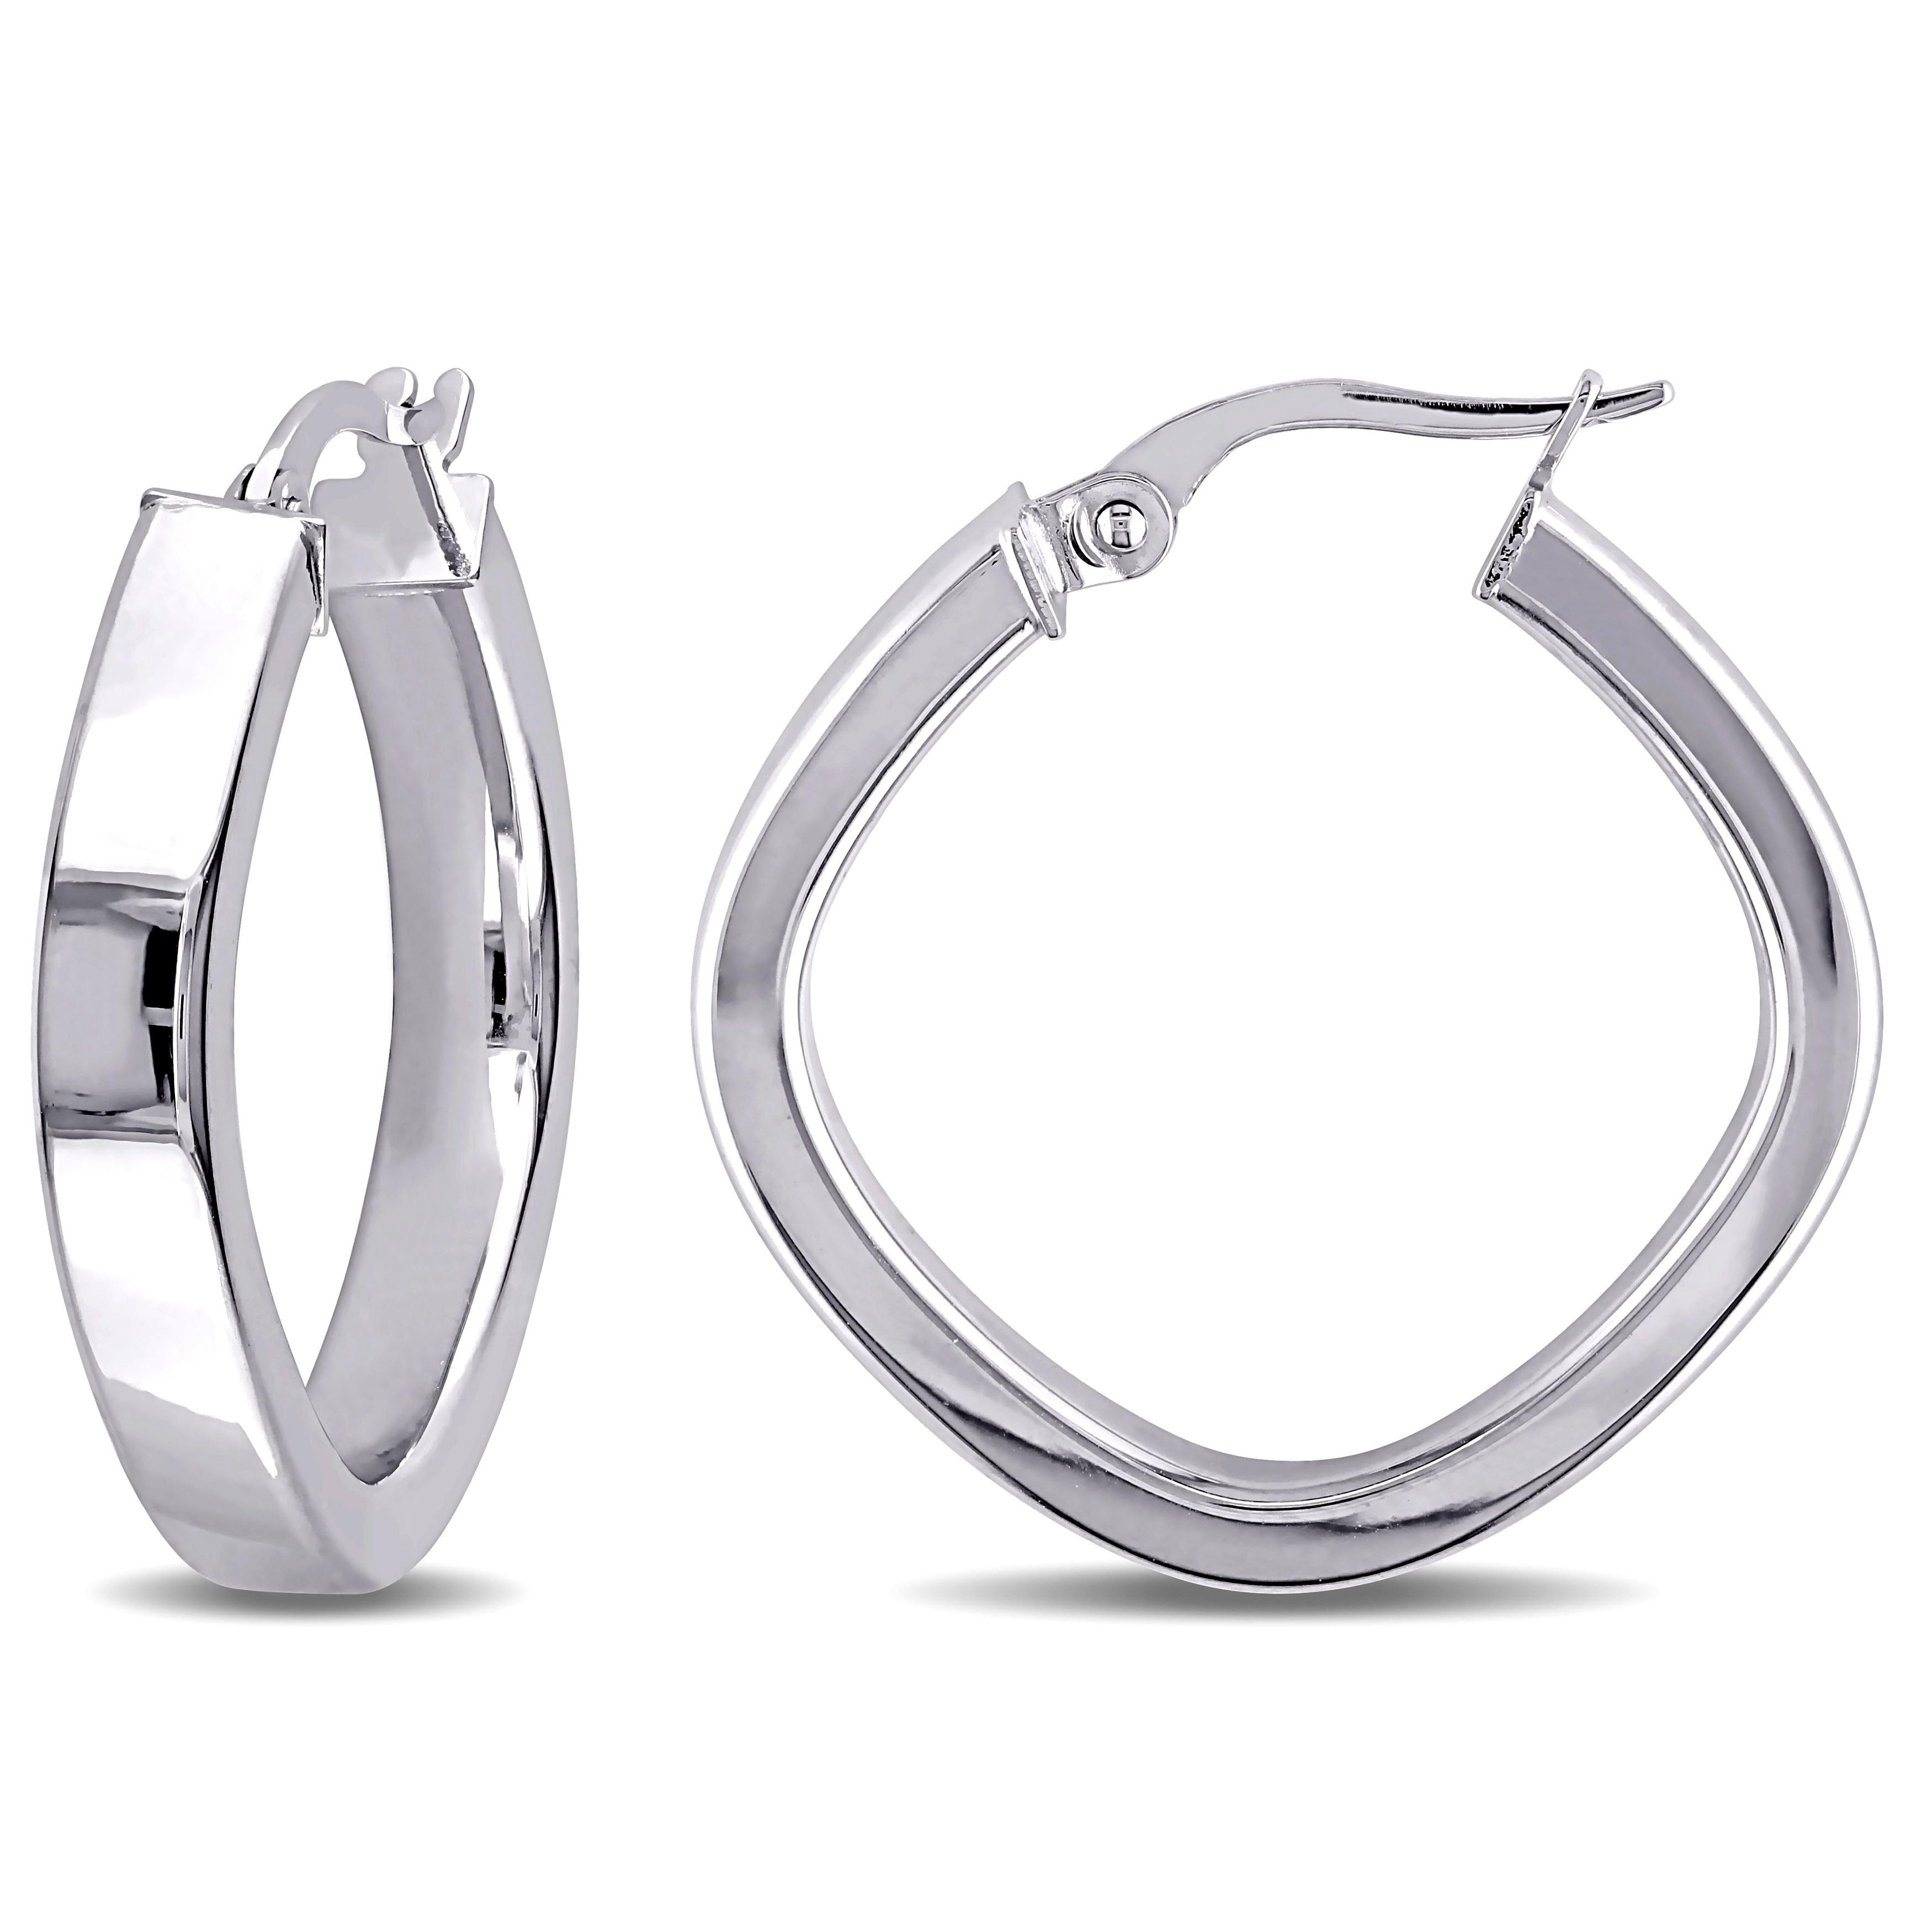 Miadora 10k White Gold Square Geometric Italian Hoop Earrings